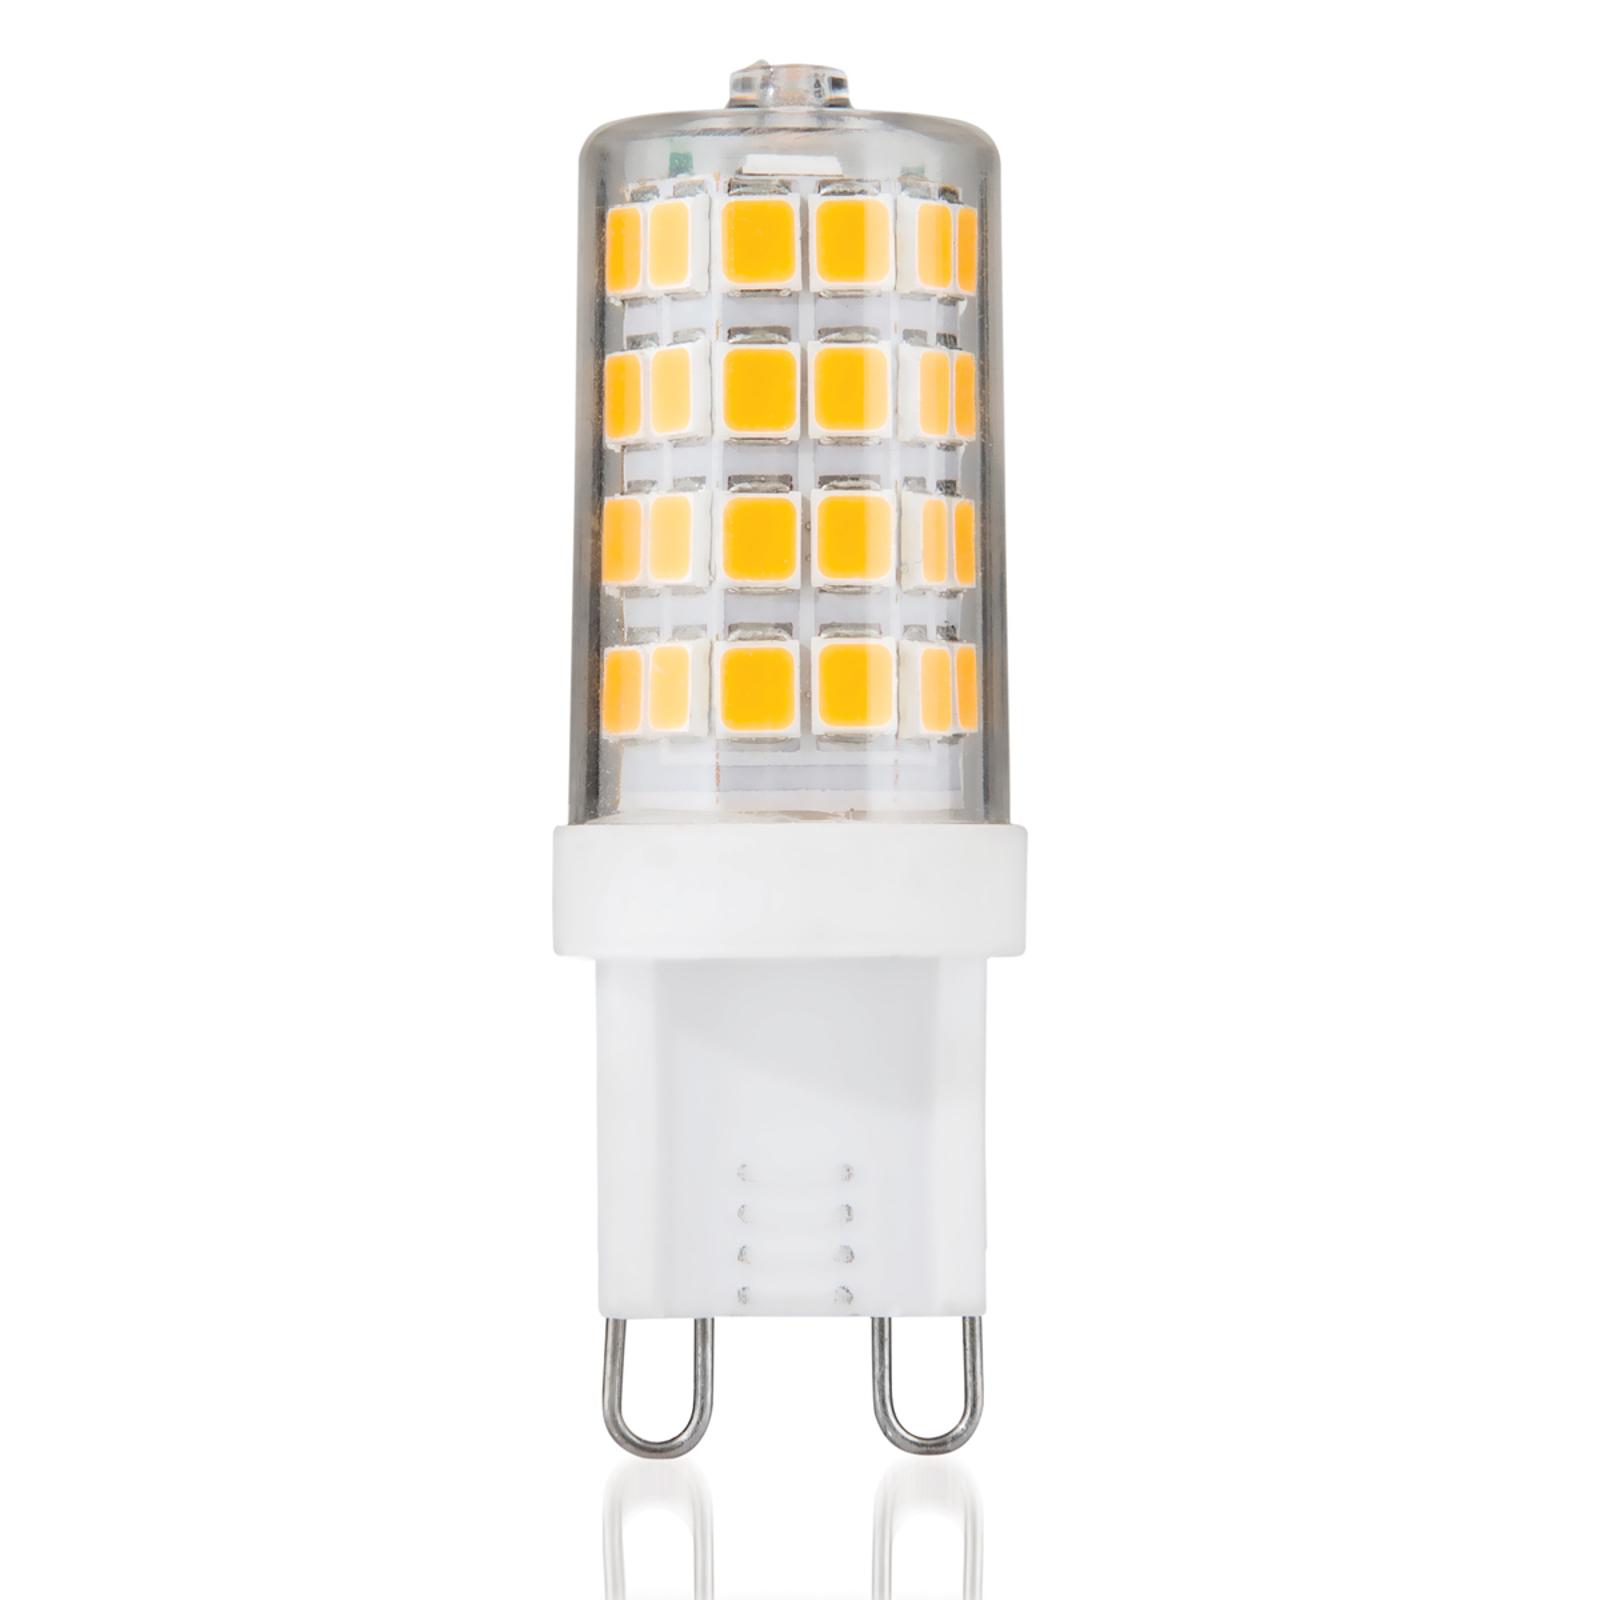 G9 4W 828 LED-kuglepenslampe